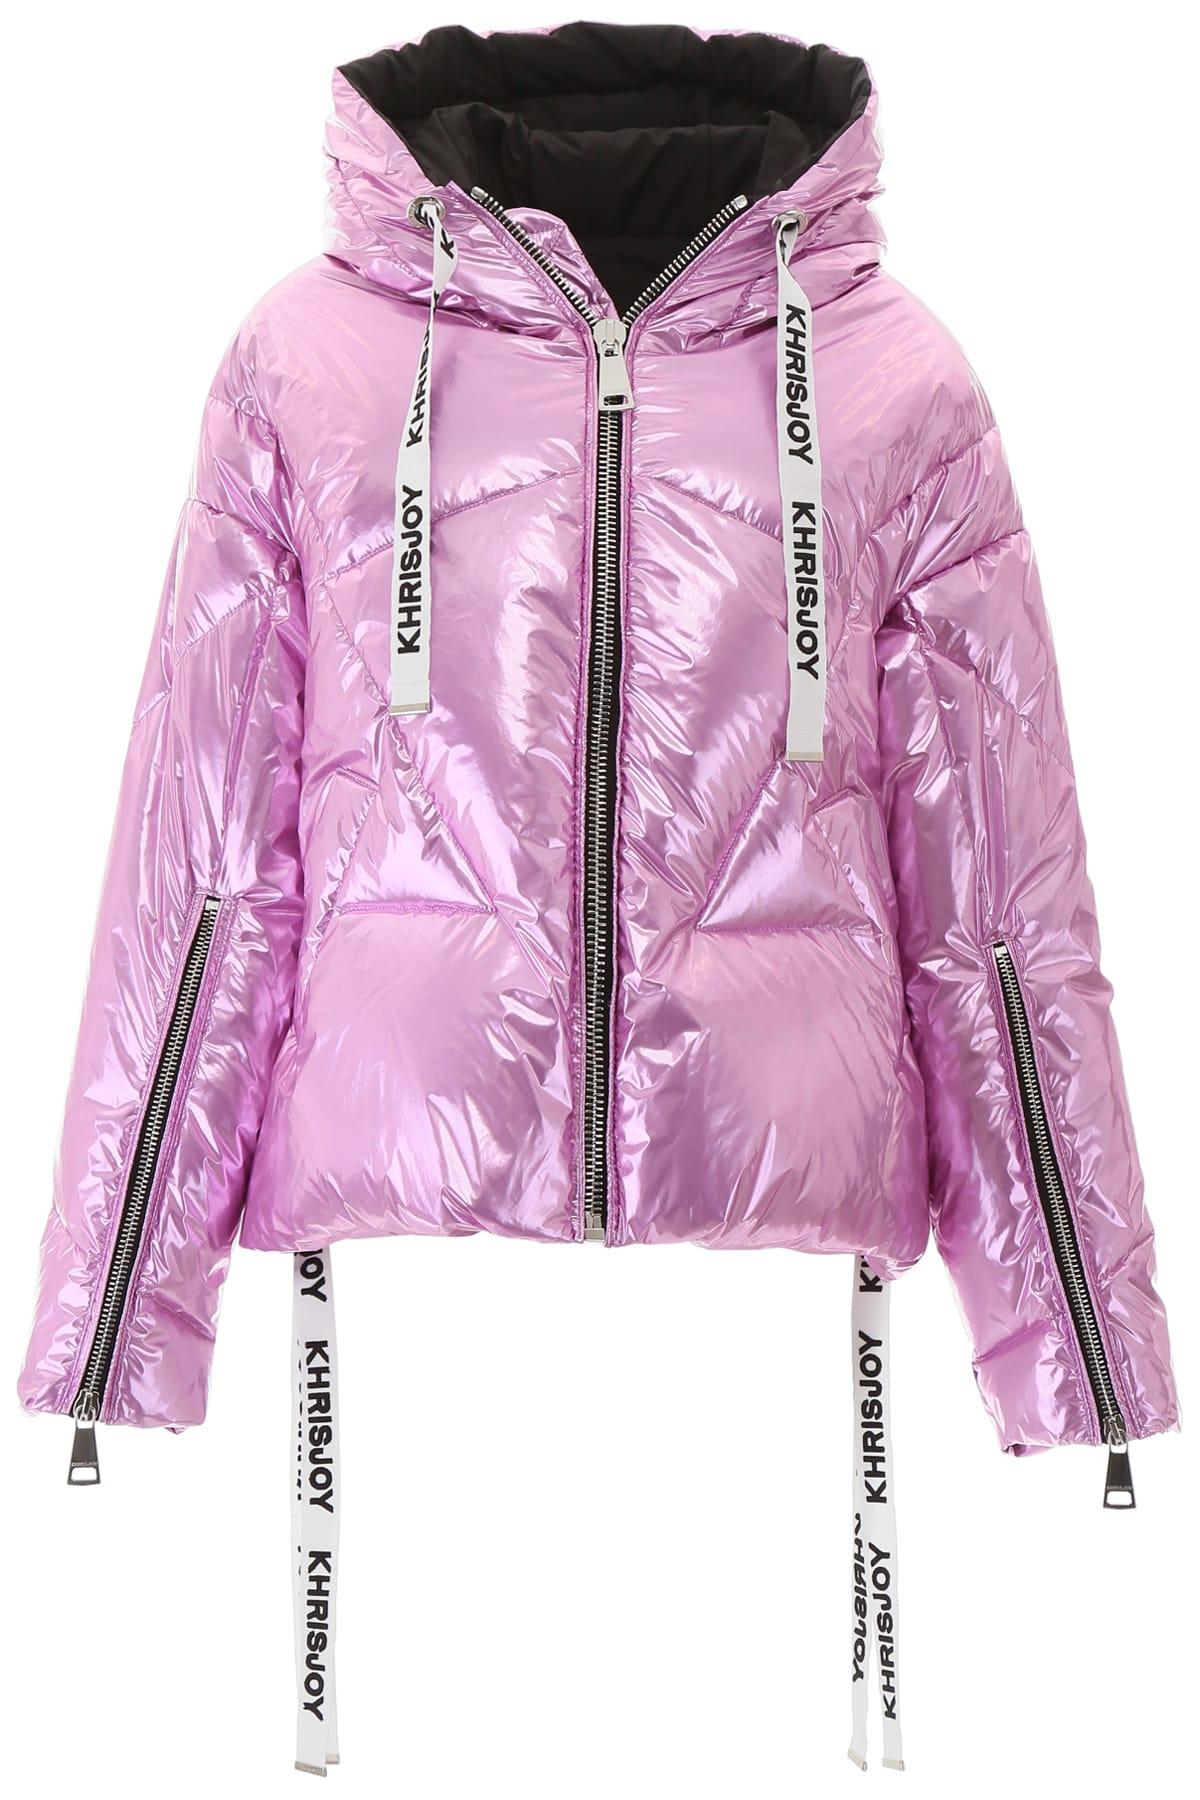 Khrisjoy Silver Khris Puffer Jacket